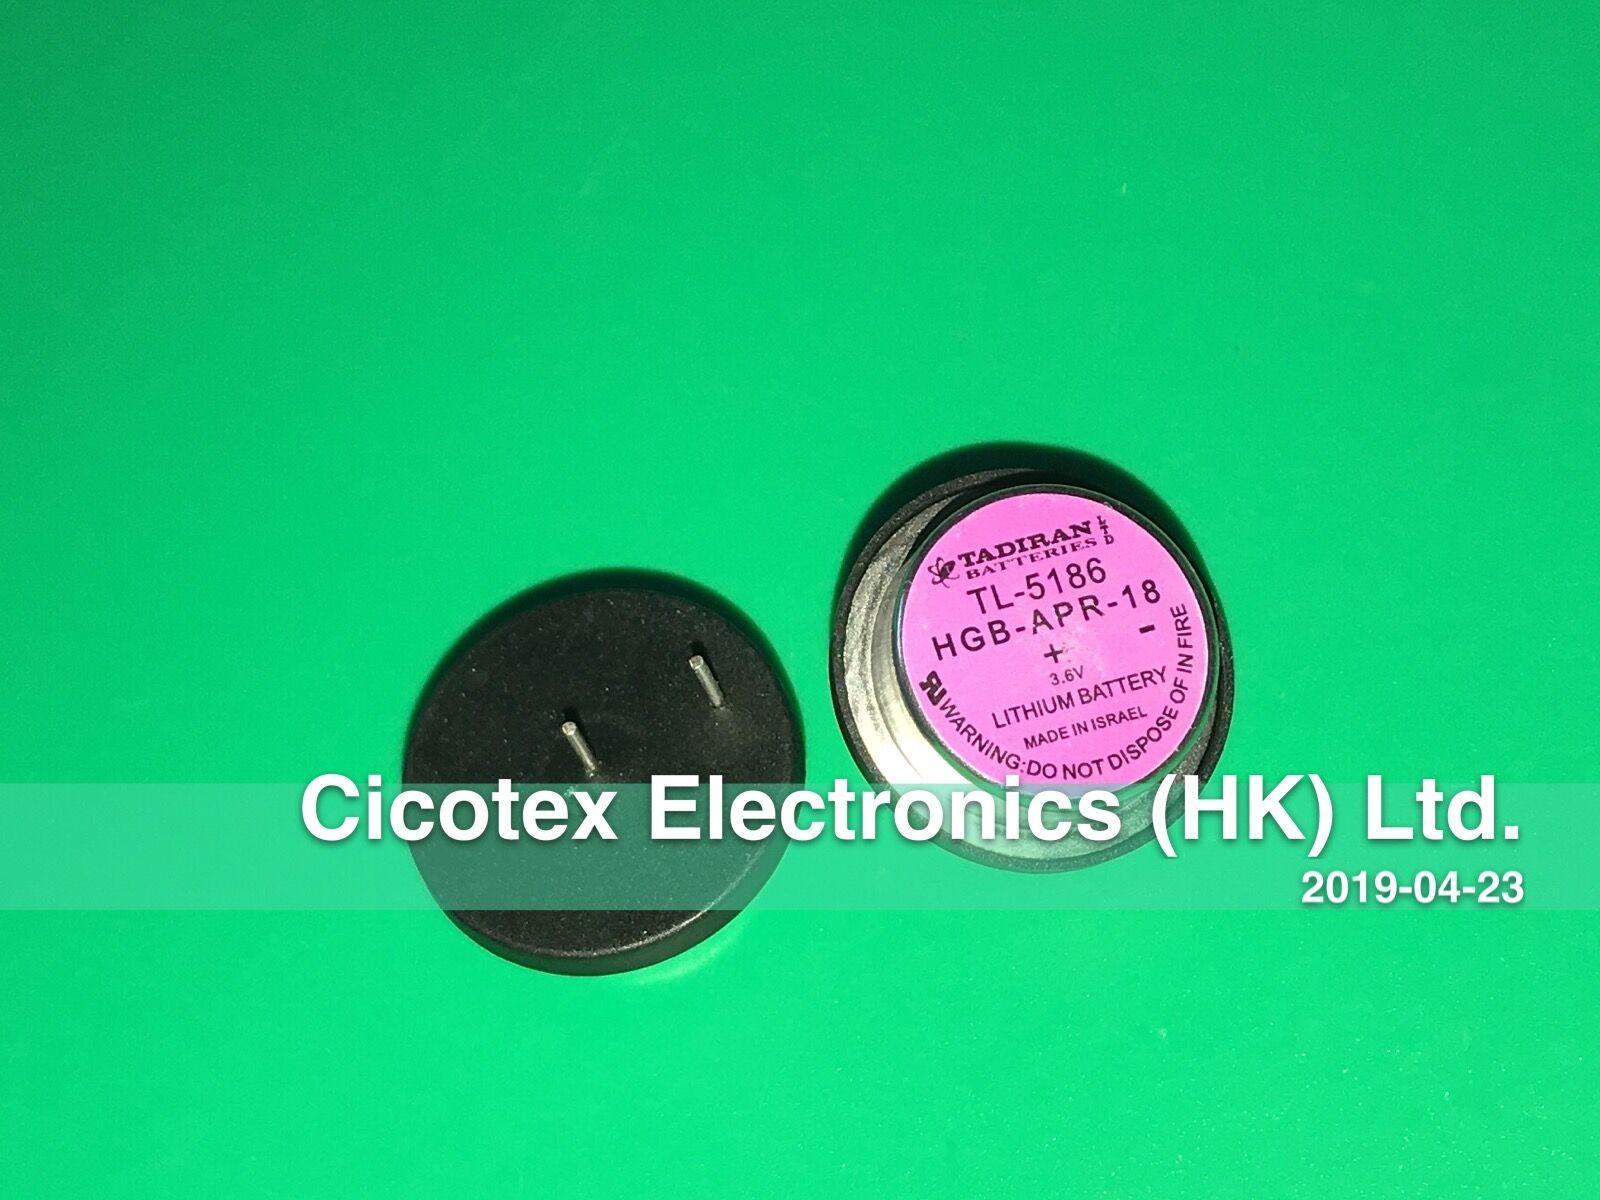 TL-5186 DIP2 BATTERY LITH 3.6V WAFER 22.8MM TL5186 HGB-APR-18